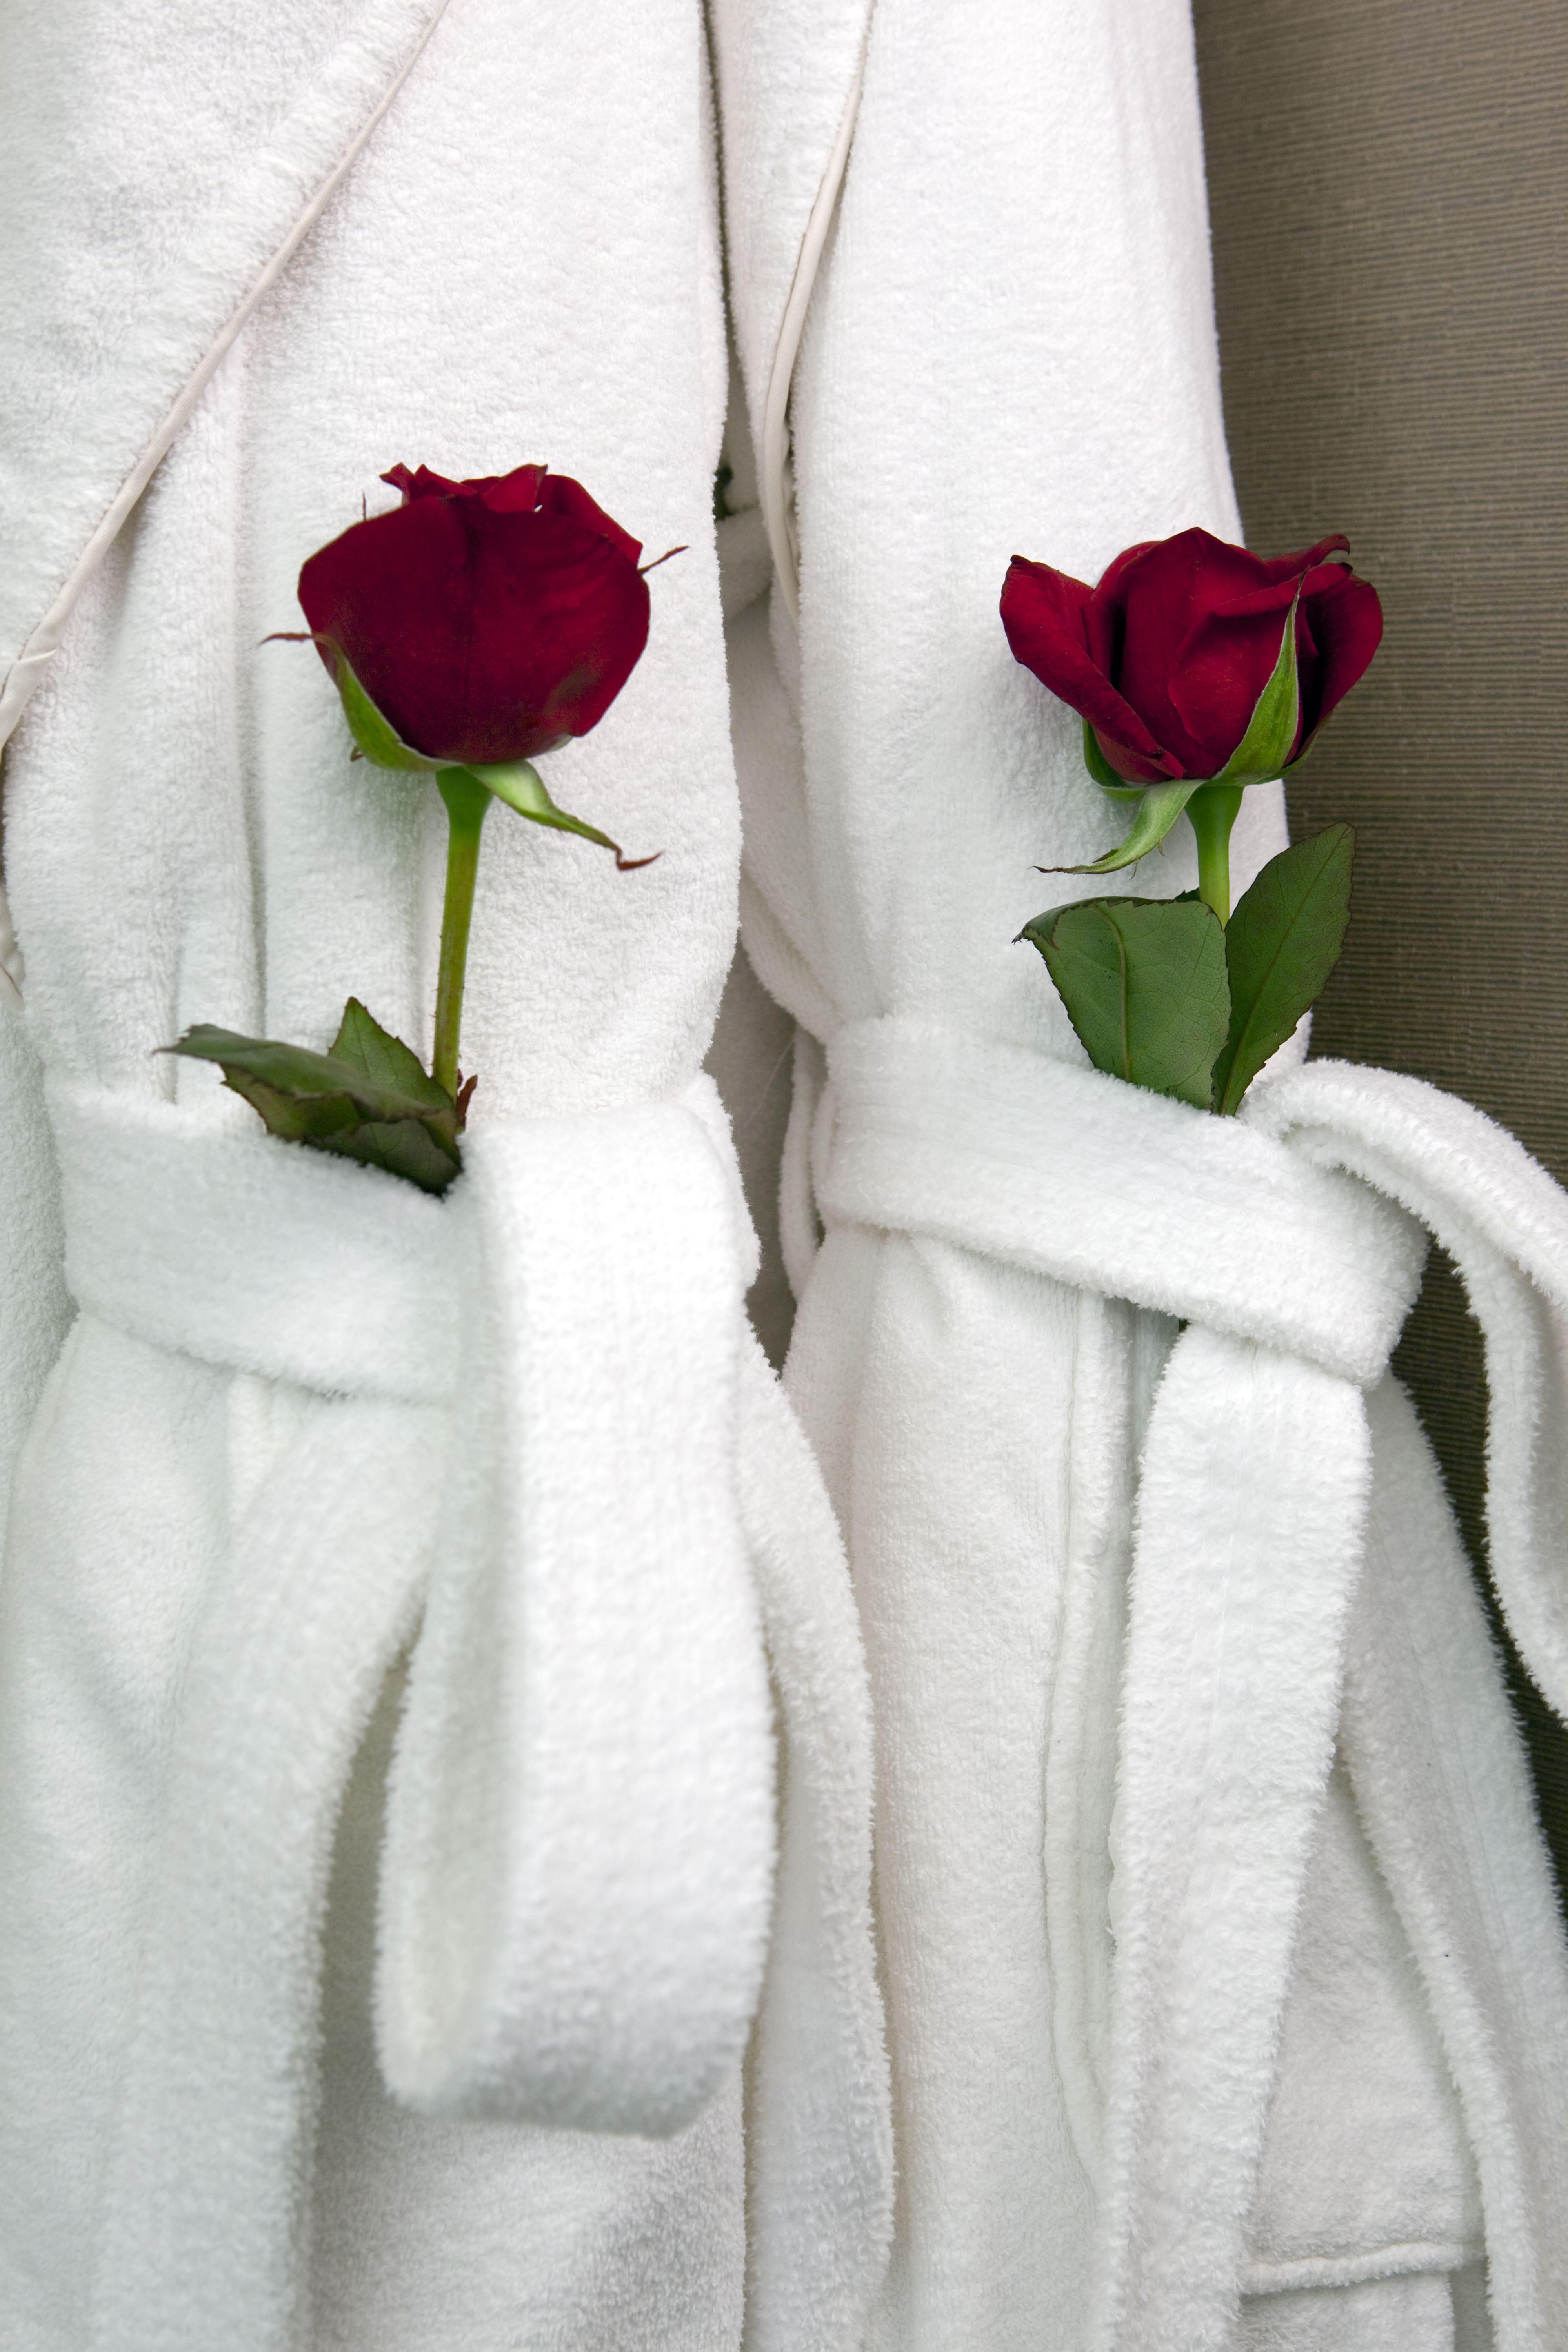 When it comes to romantic hotel experiences, unique